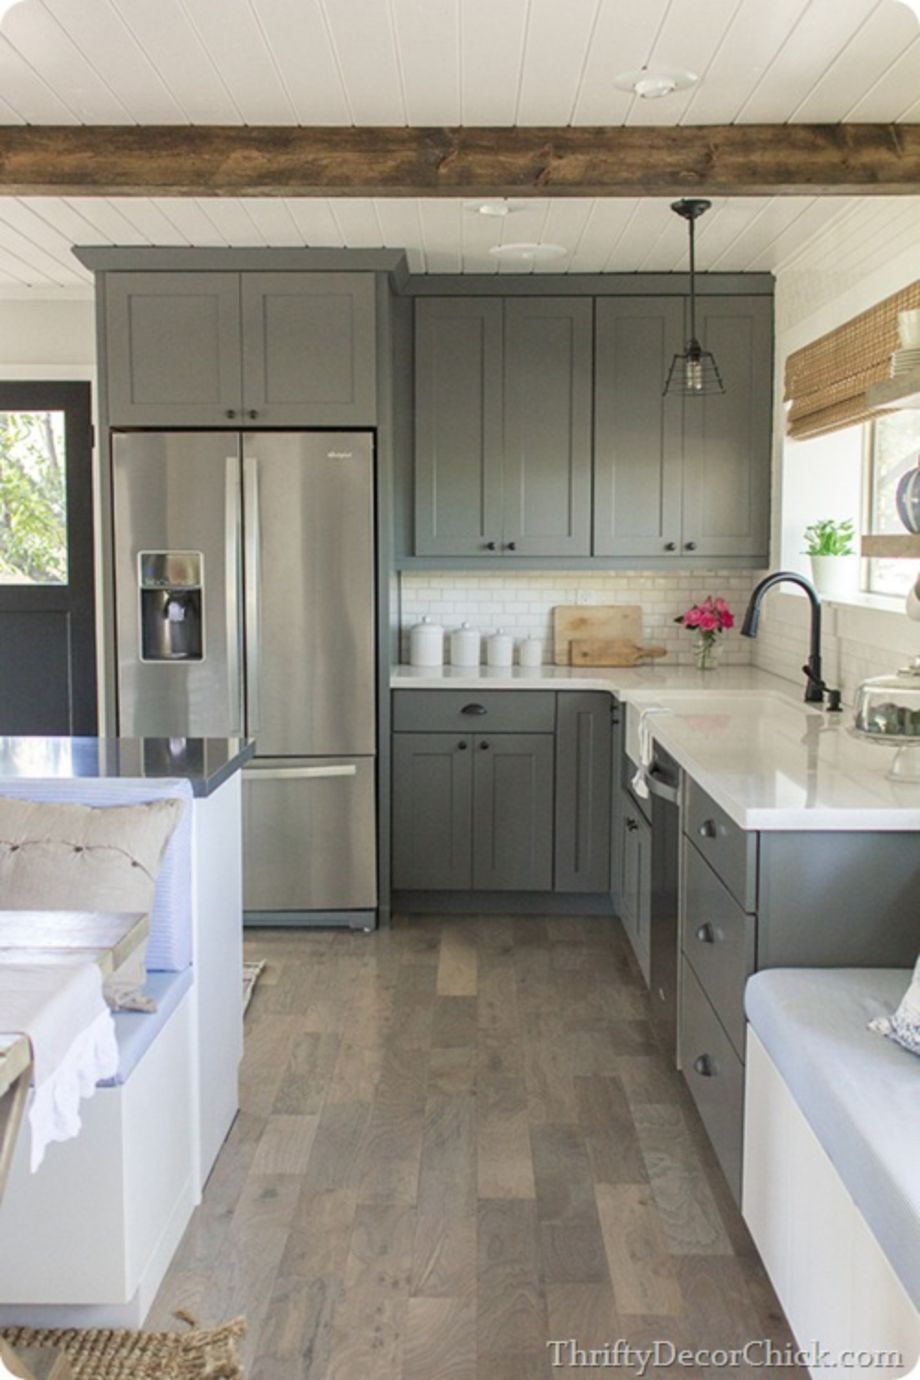 Amazing simple and gorgeous kitchen floor tiles design ideas